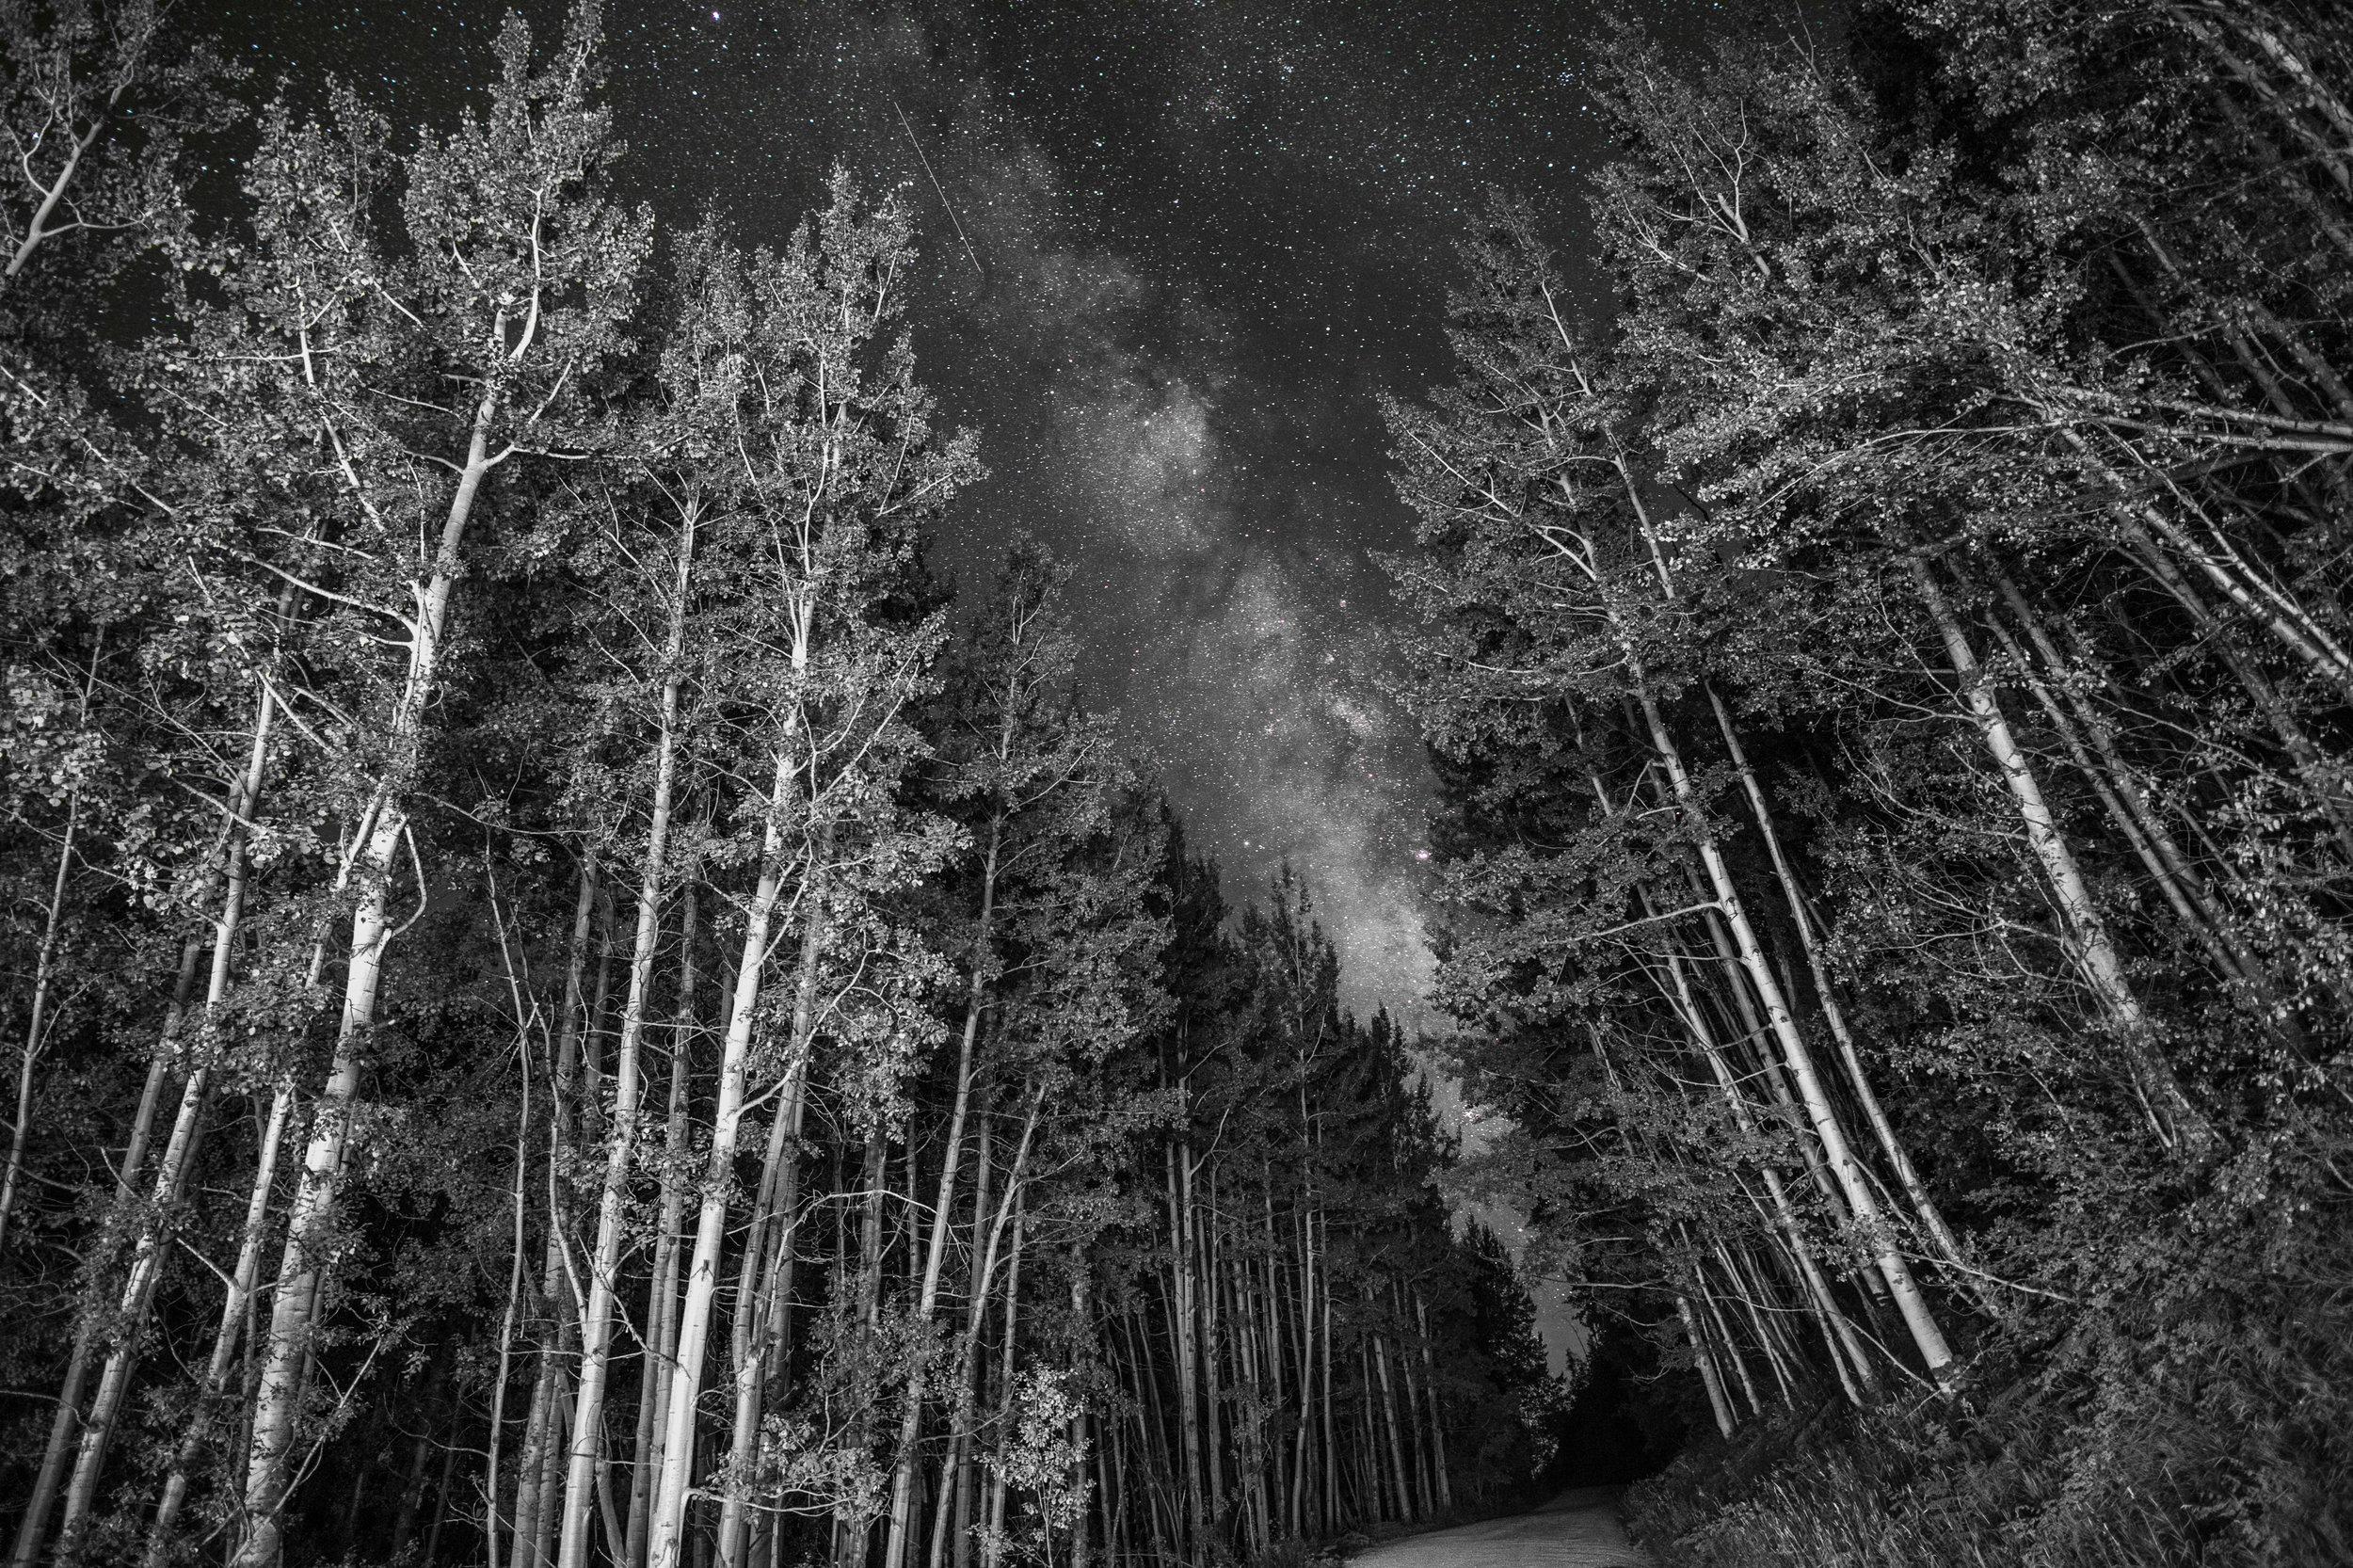 Purgatory Milky Way, Image # 7601